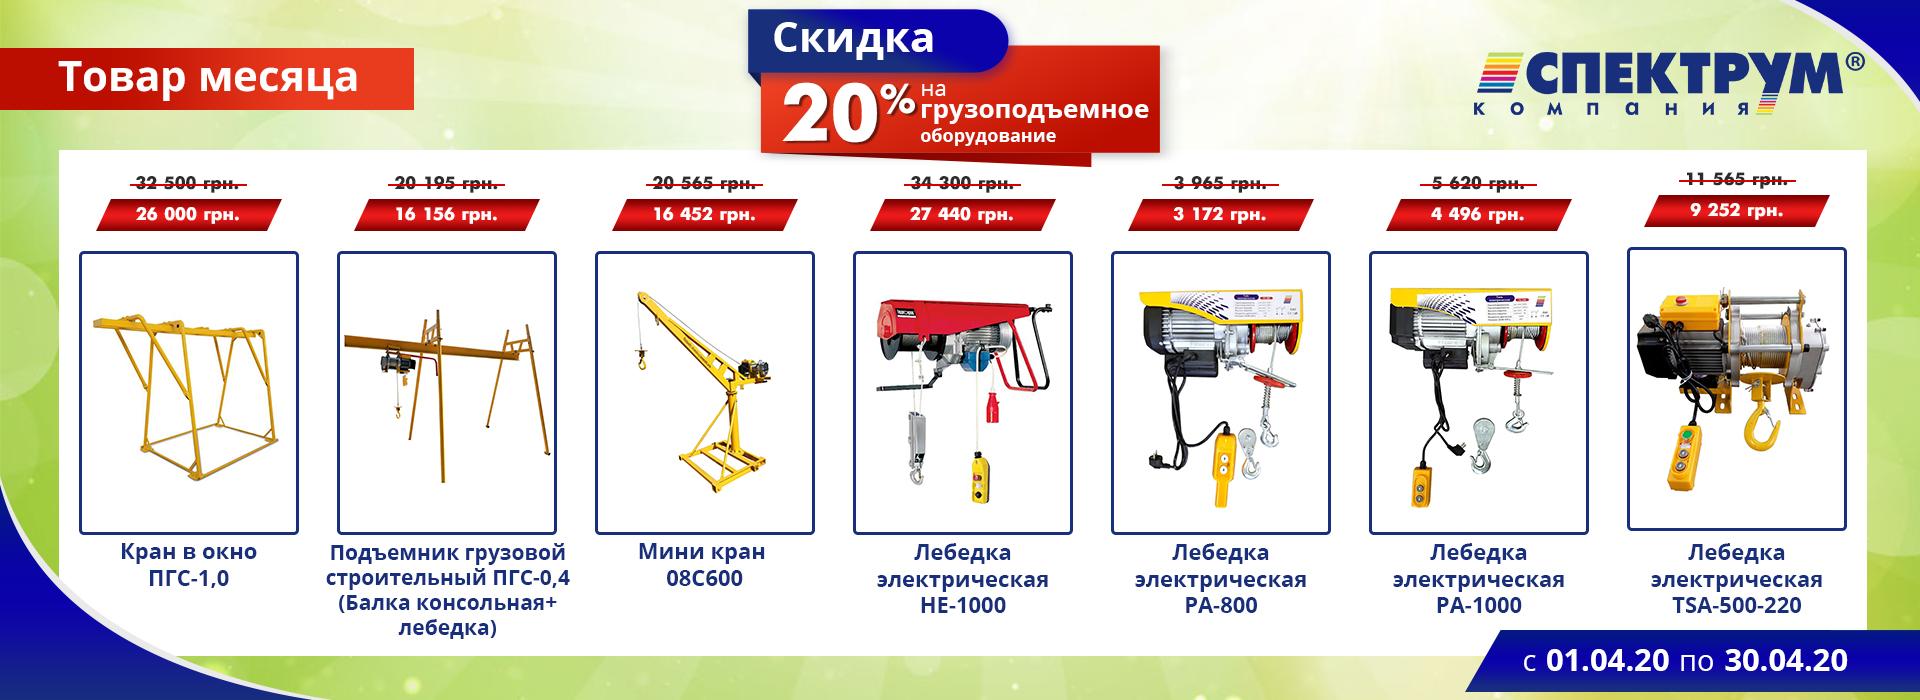 akcija-01.04.20-30.04.20